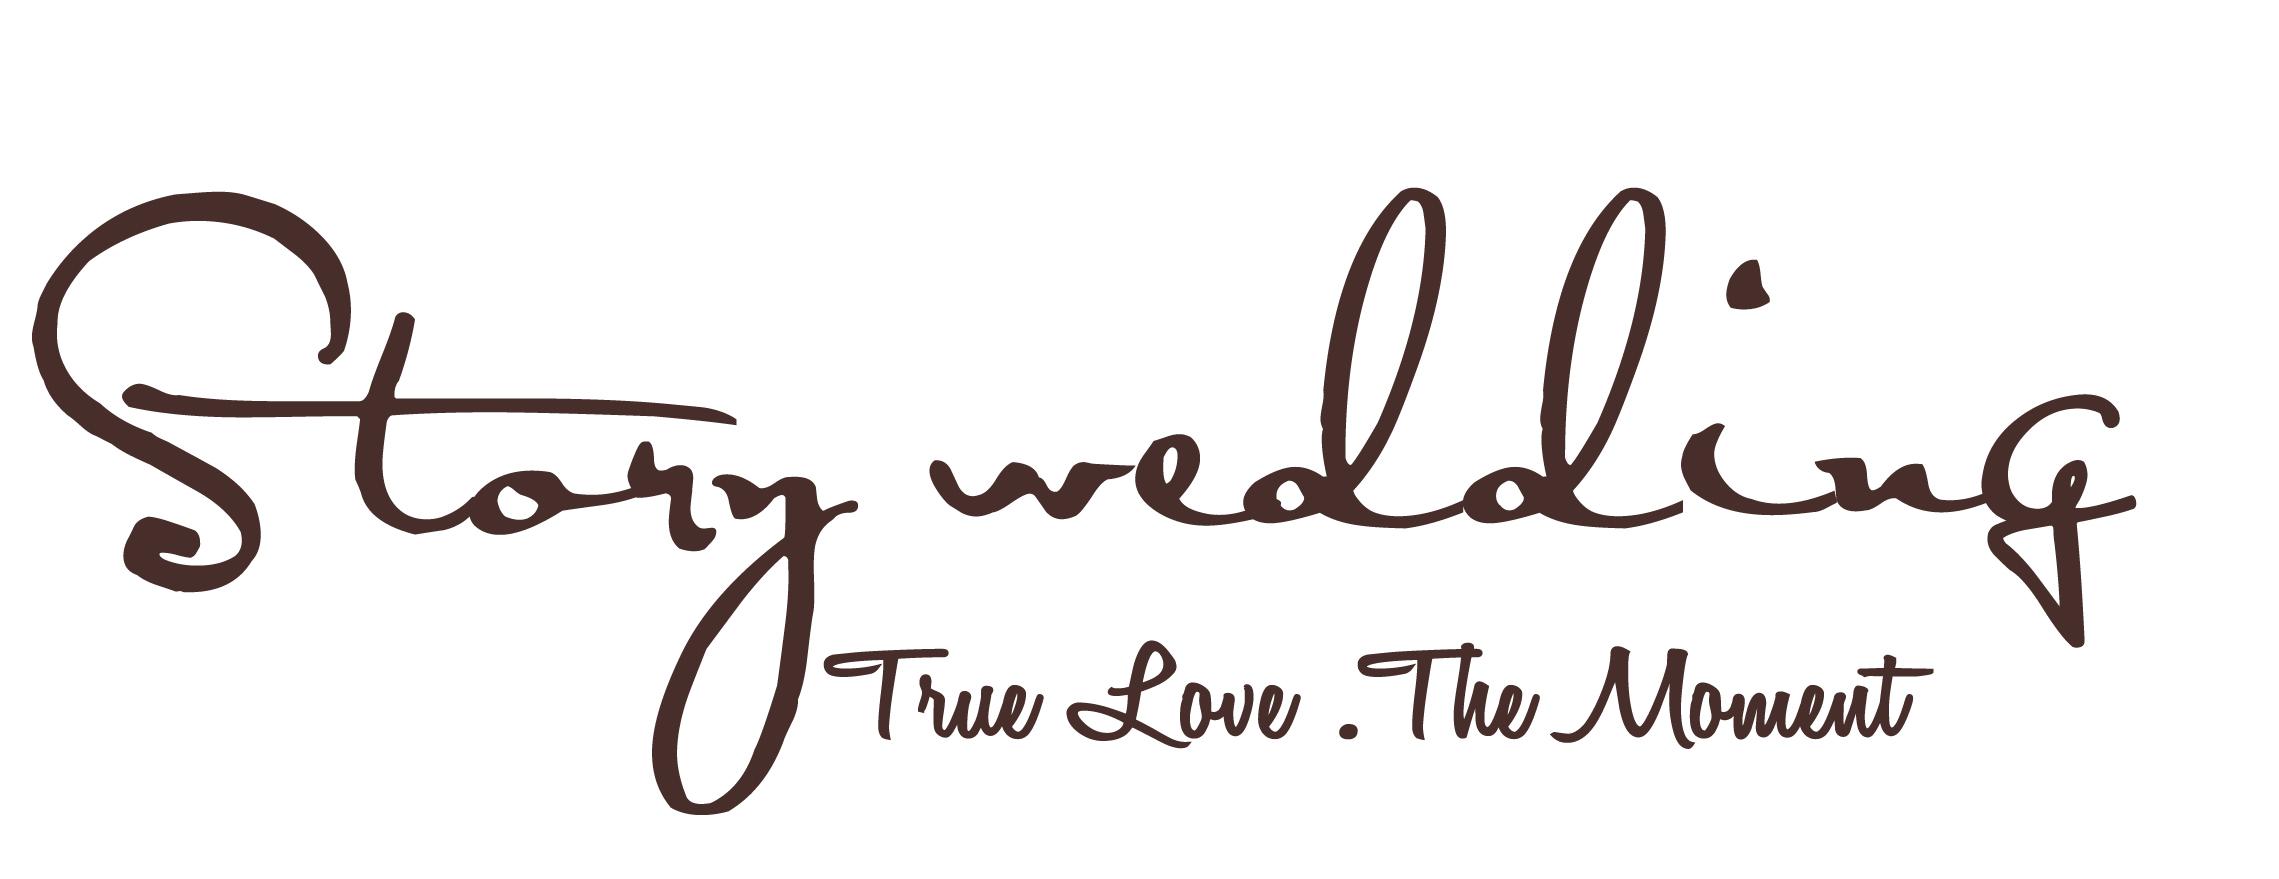 Story wedding logo